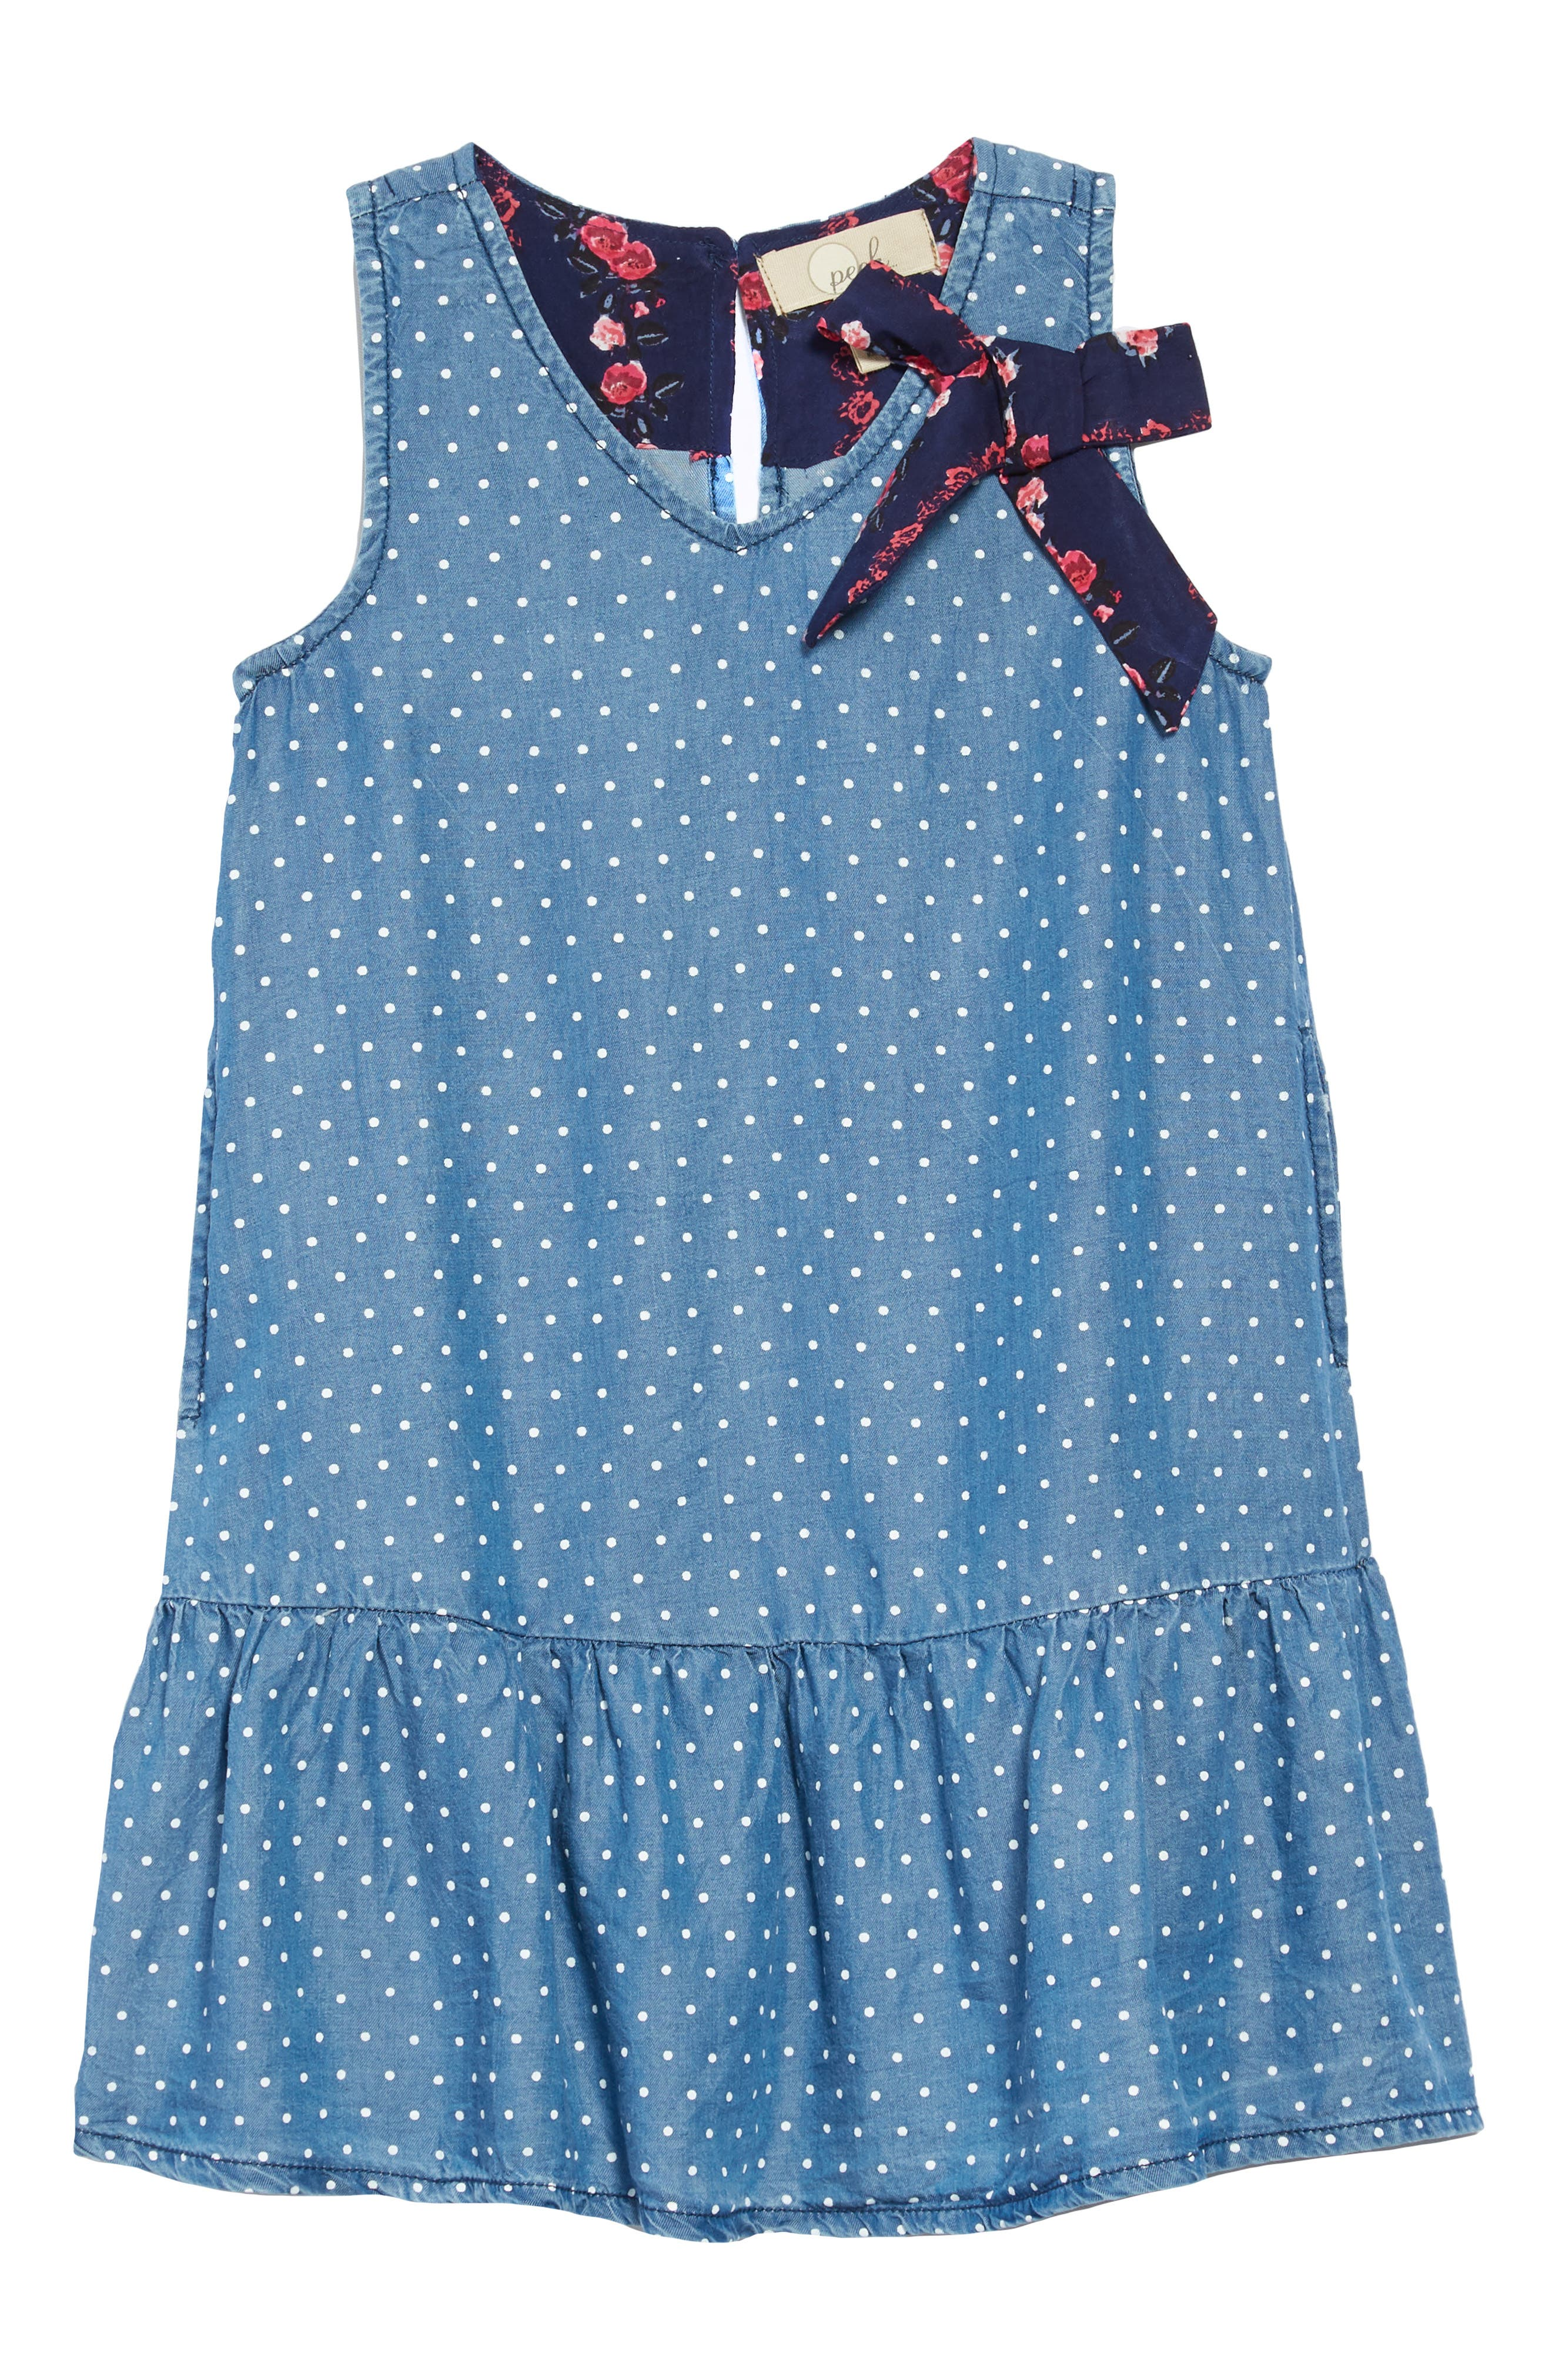 Peek Miley Chambray Drop Waist Dress,                         Main,                         color, 400